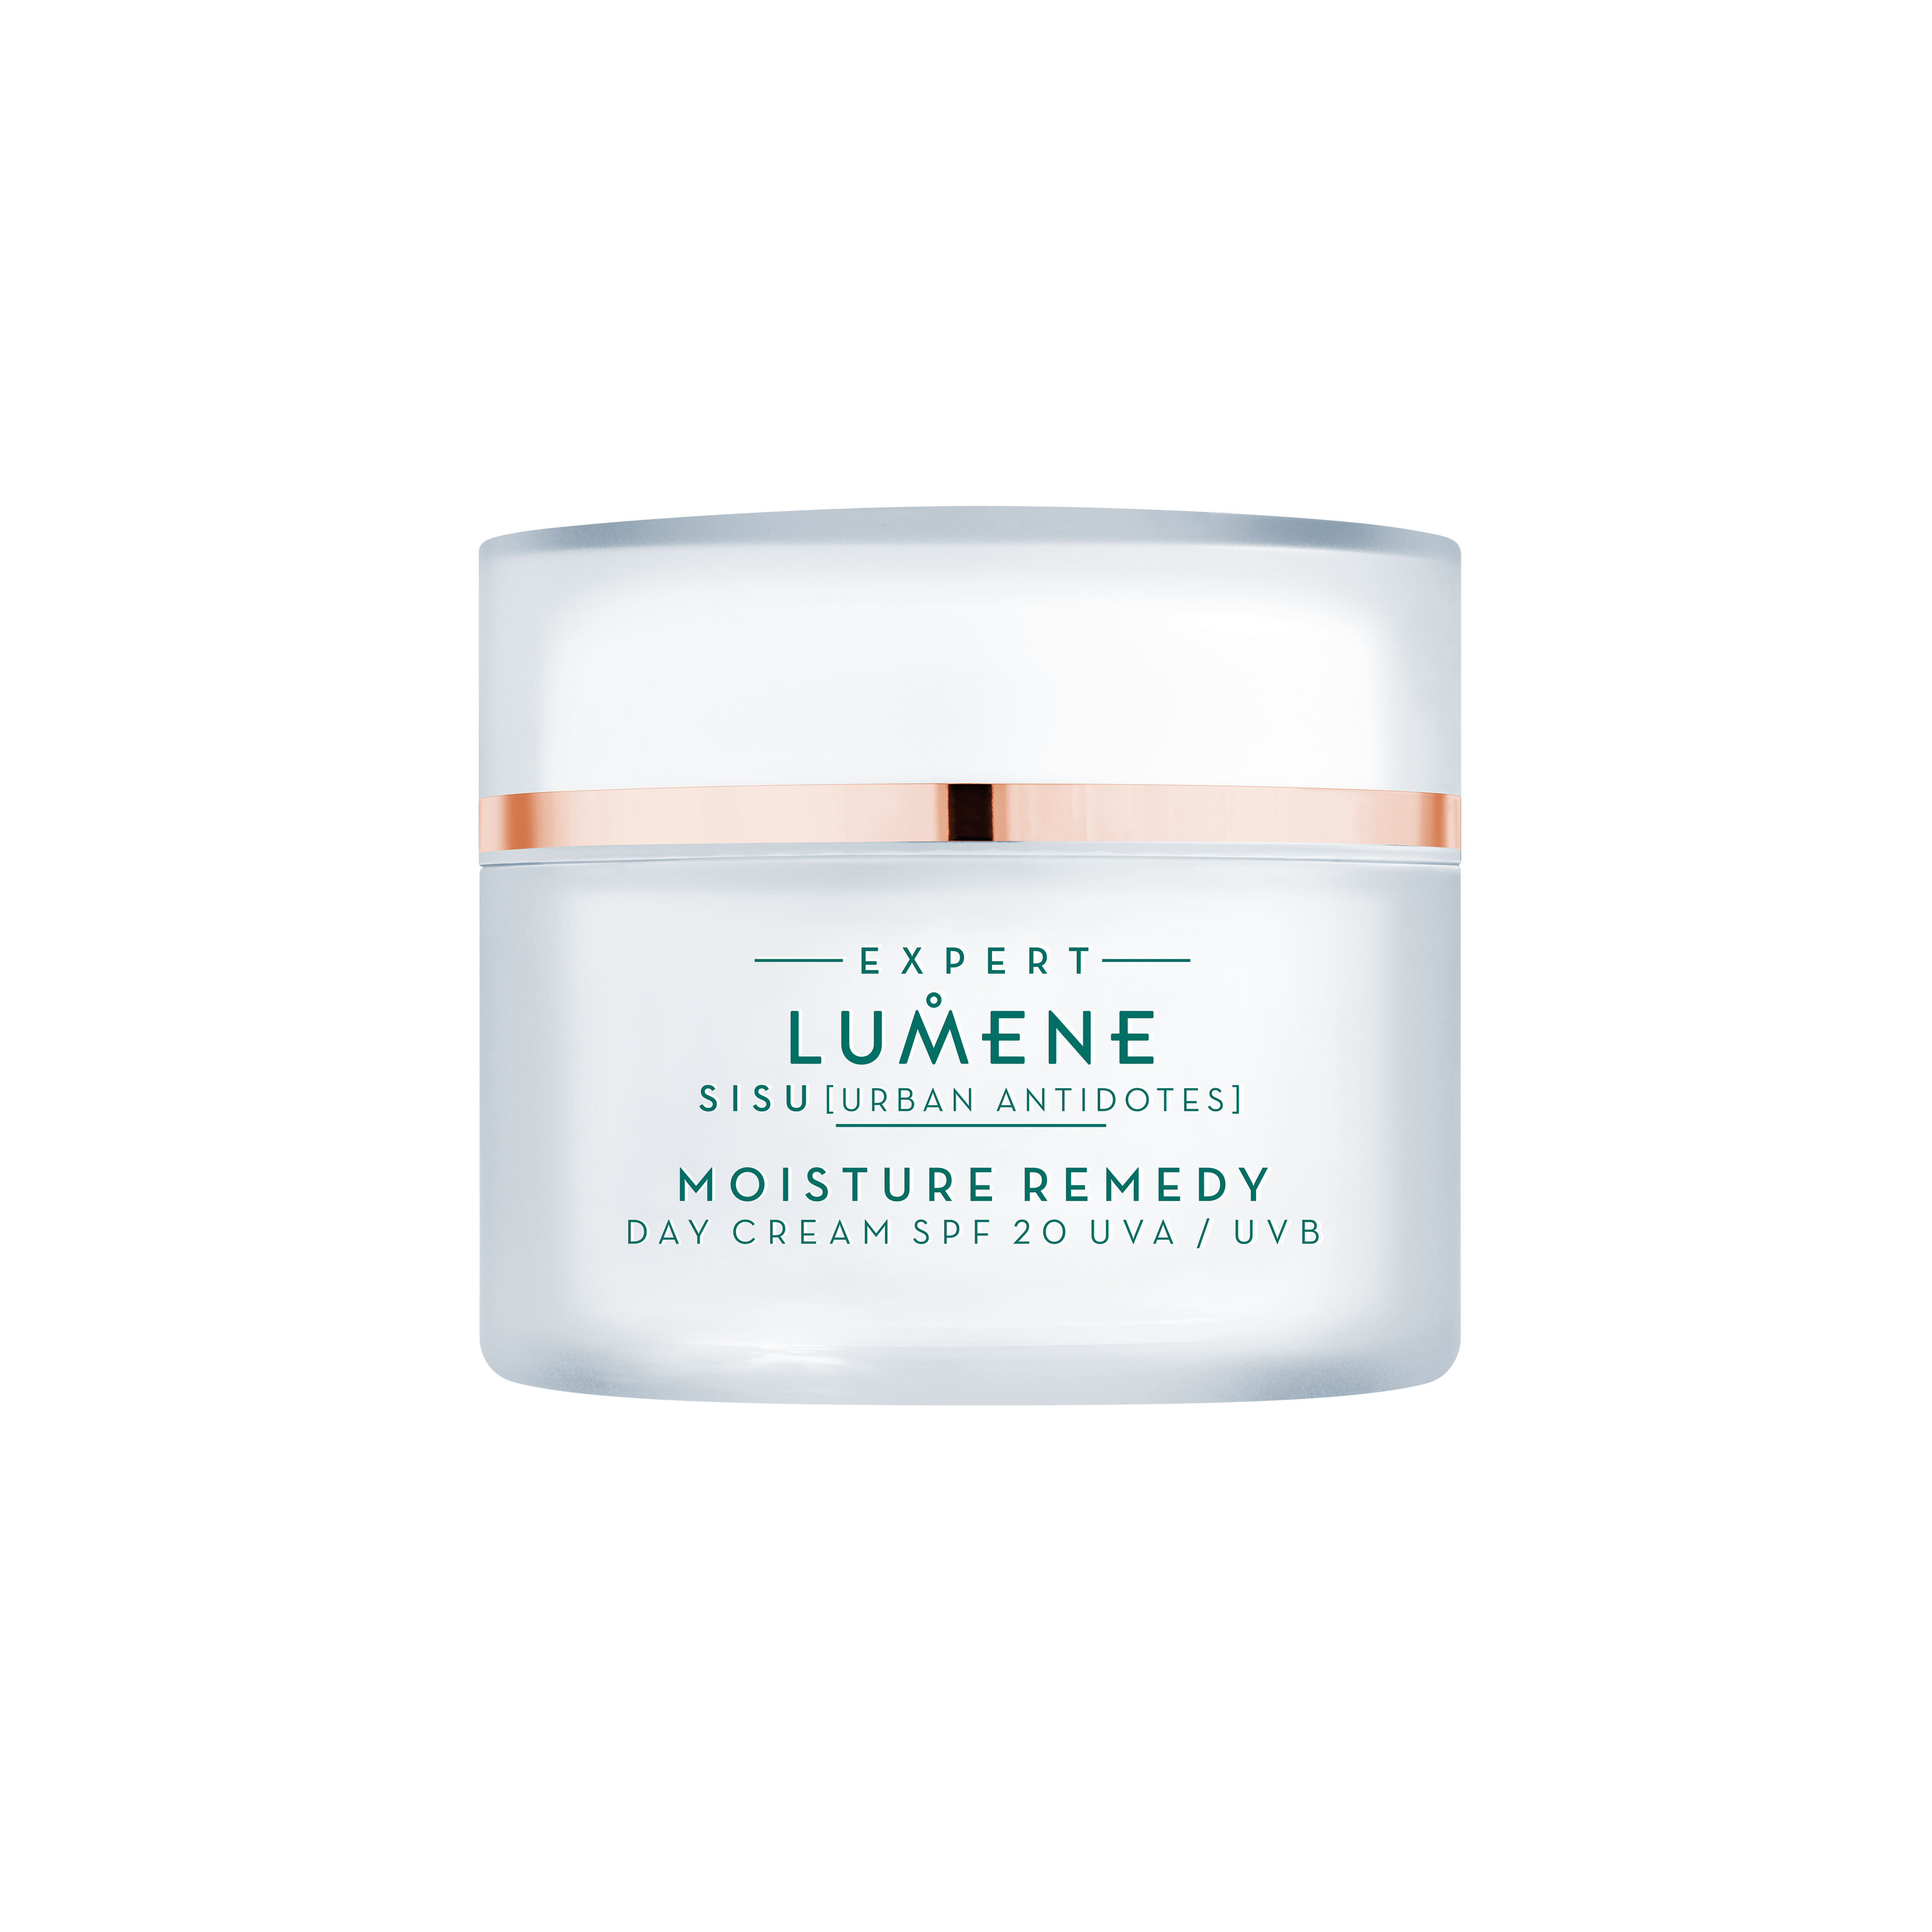 Sisu NORDIC DETOX Moisture Remedy Day Cream SPF20 50ml